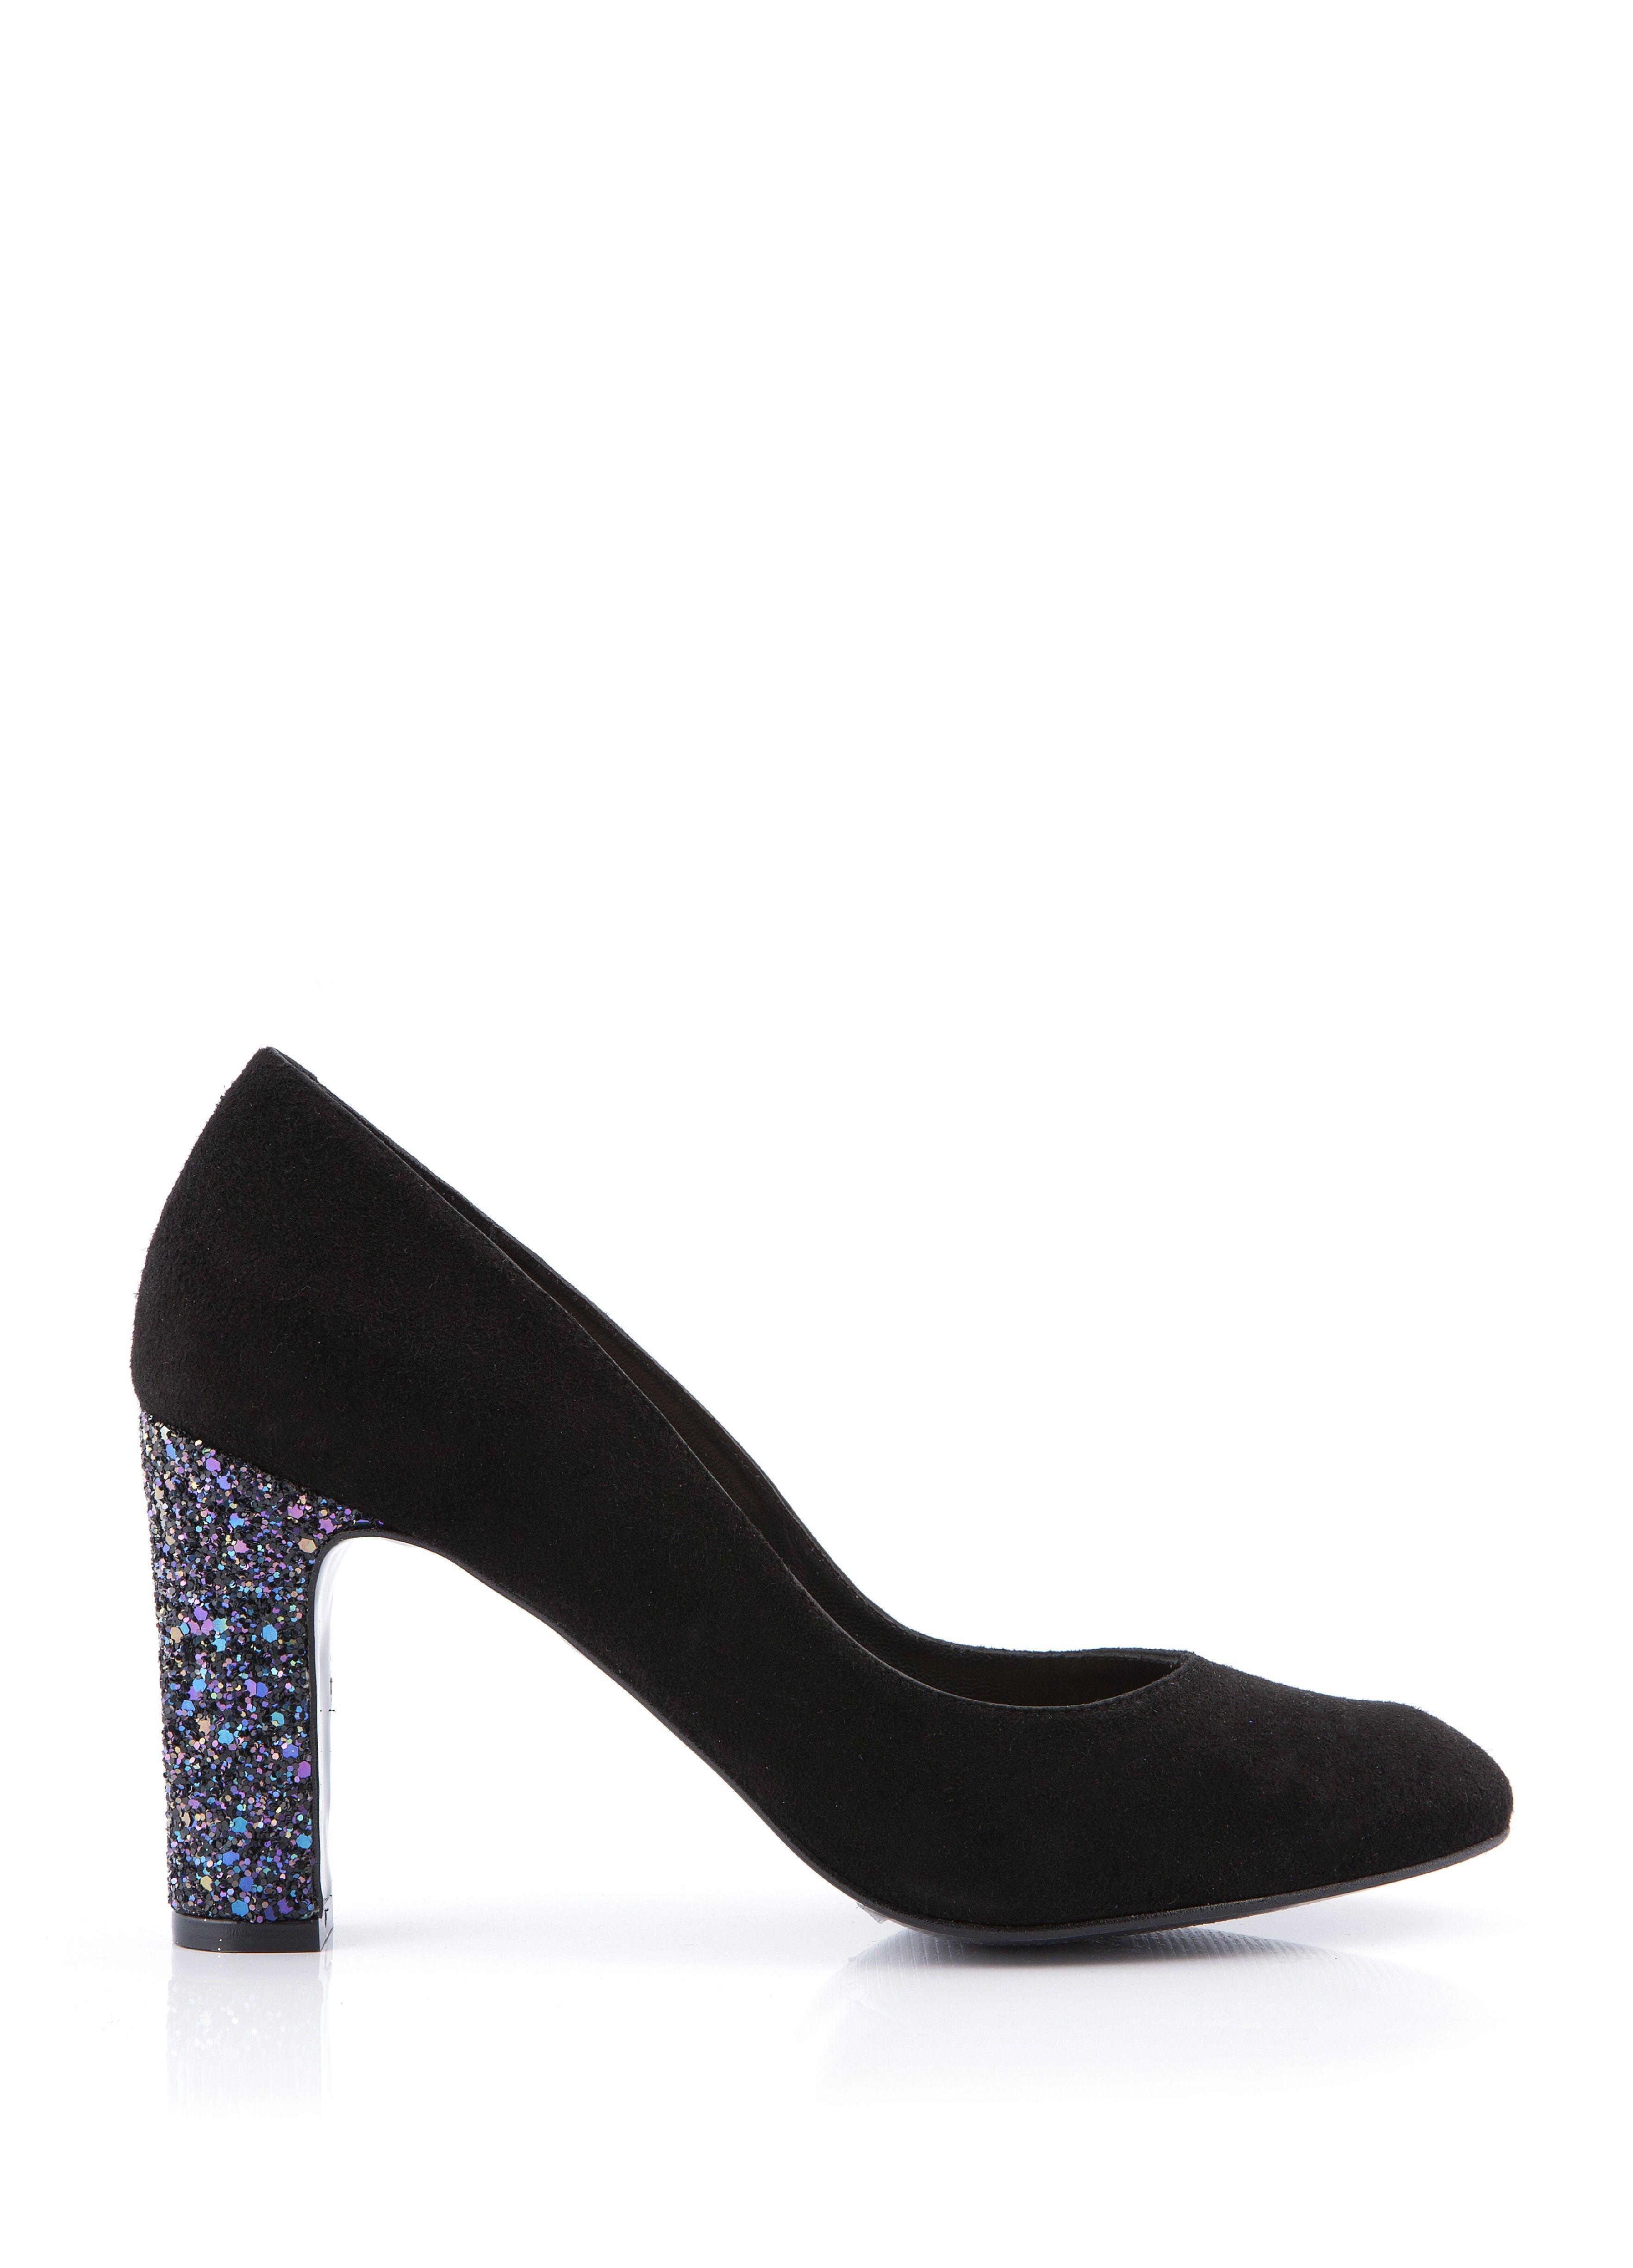 Pompes Marine Bianca Chaussures Evita sz4qbAP